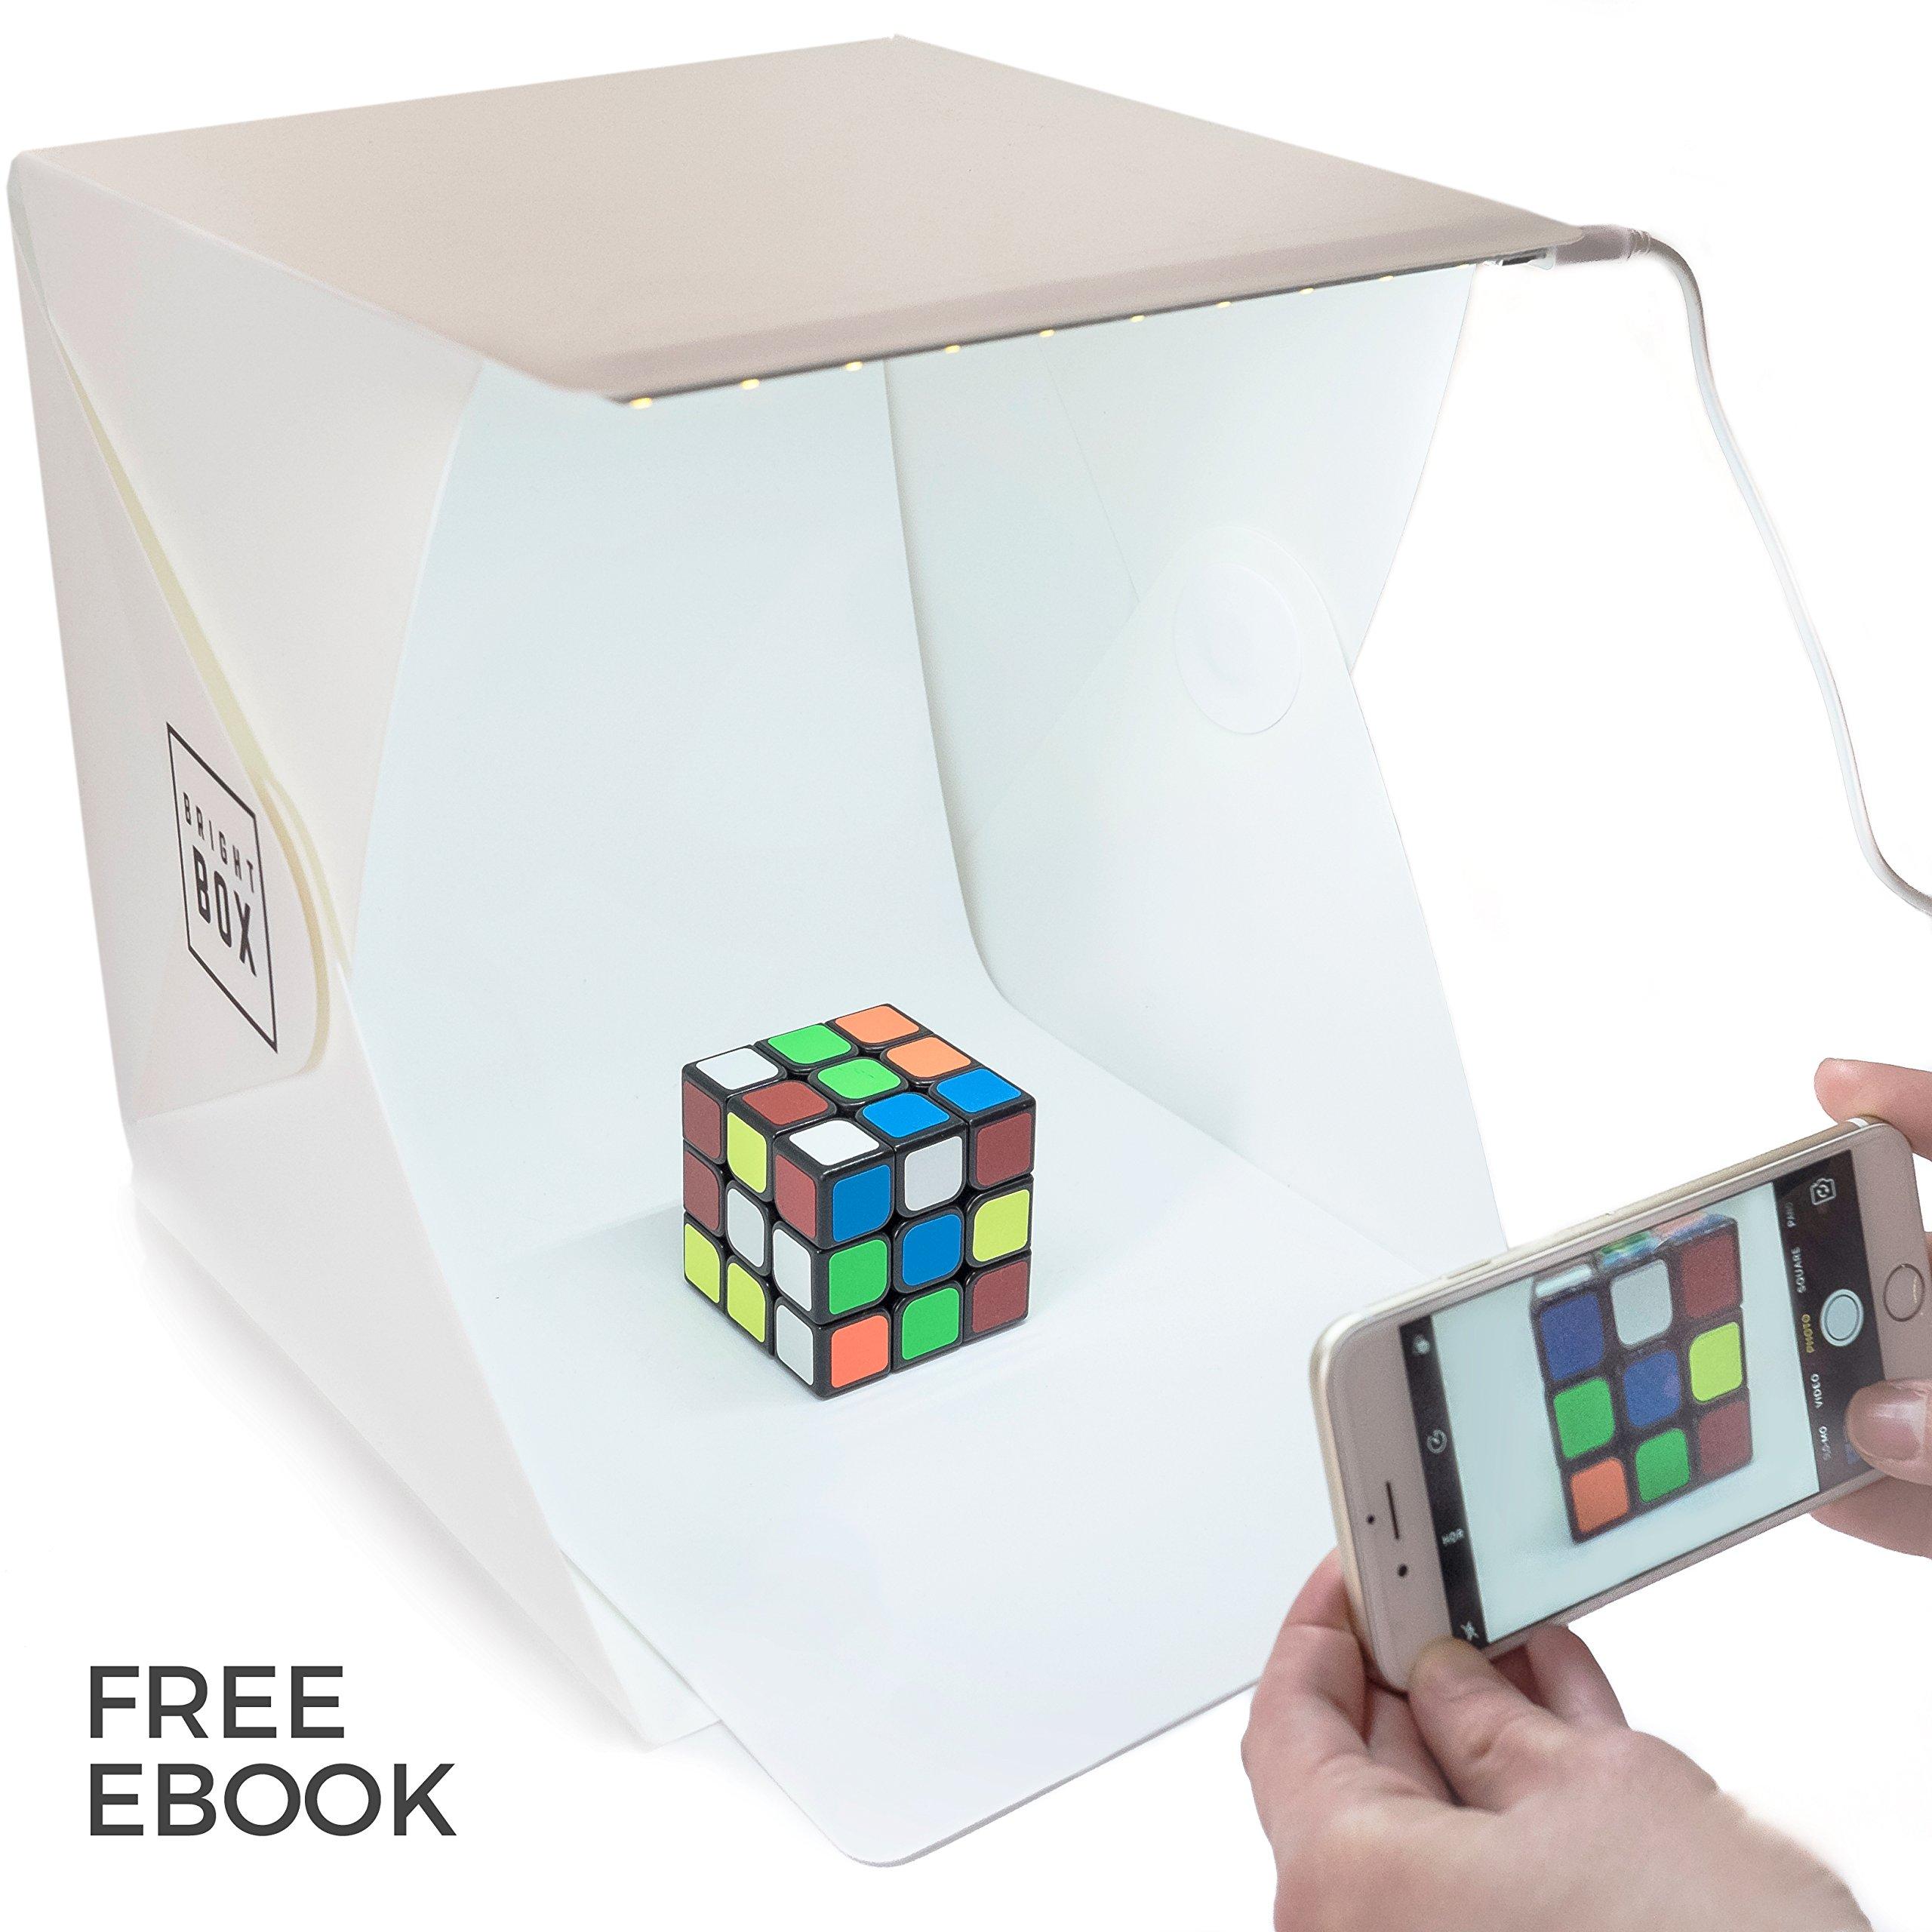 Gordon & Bond BrightBox Portable Mini Photo Studio with LED Light - The Best Small Folding Product Lighting Kit Light Box Tent (+ Free ebook Guide to Product Photography) by Gordon & Bond